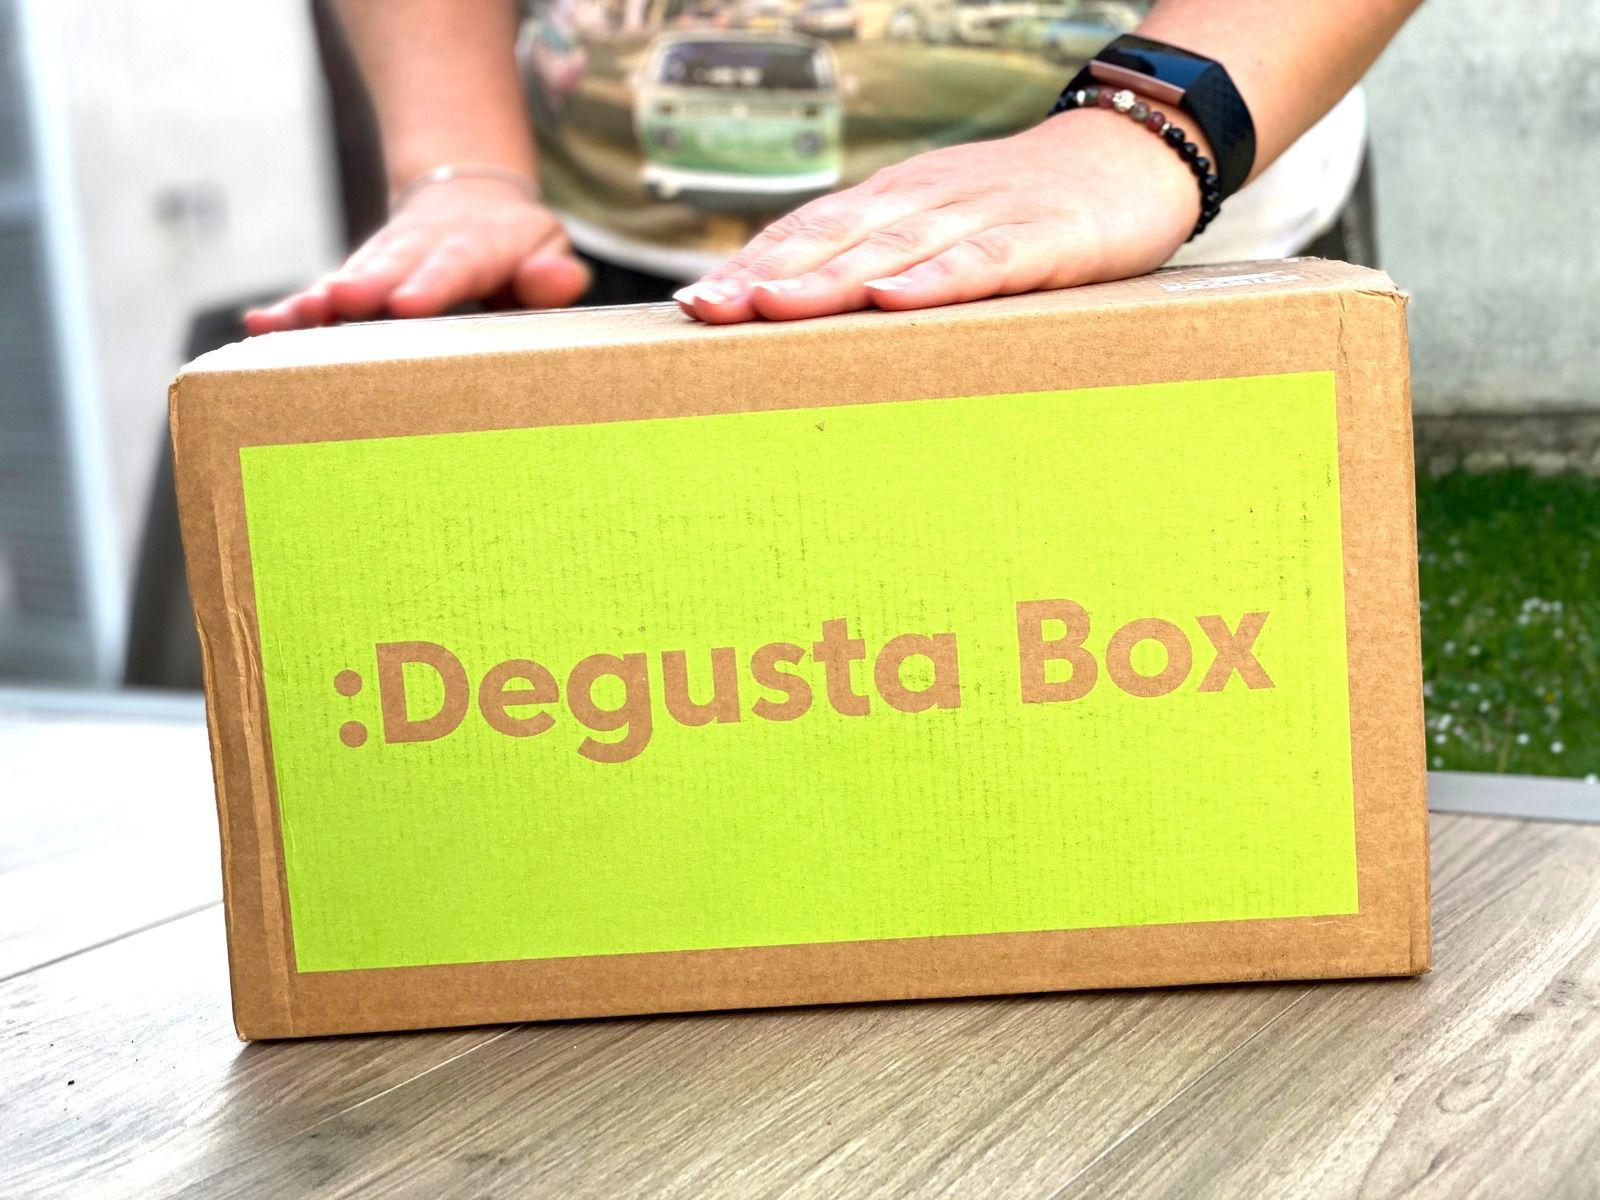 :Degusta Box : unboxing